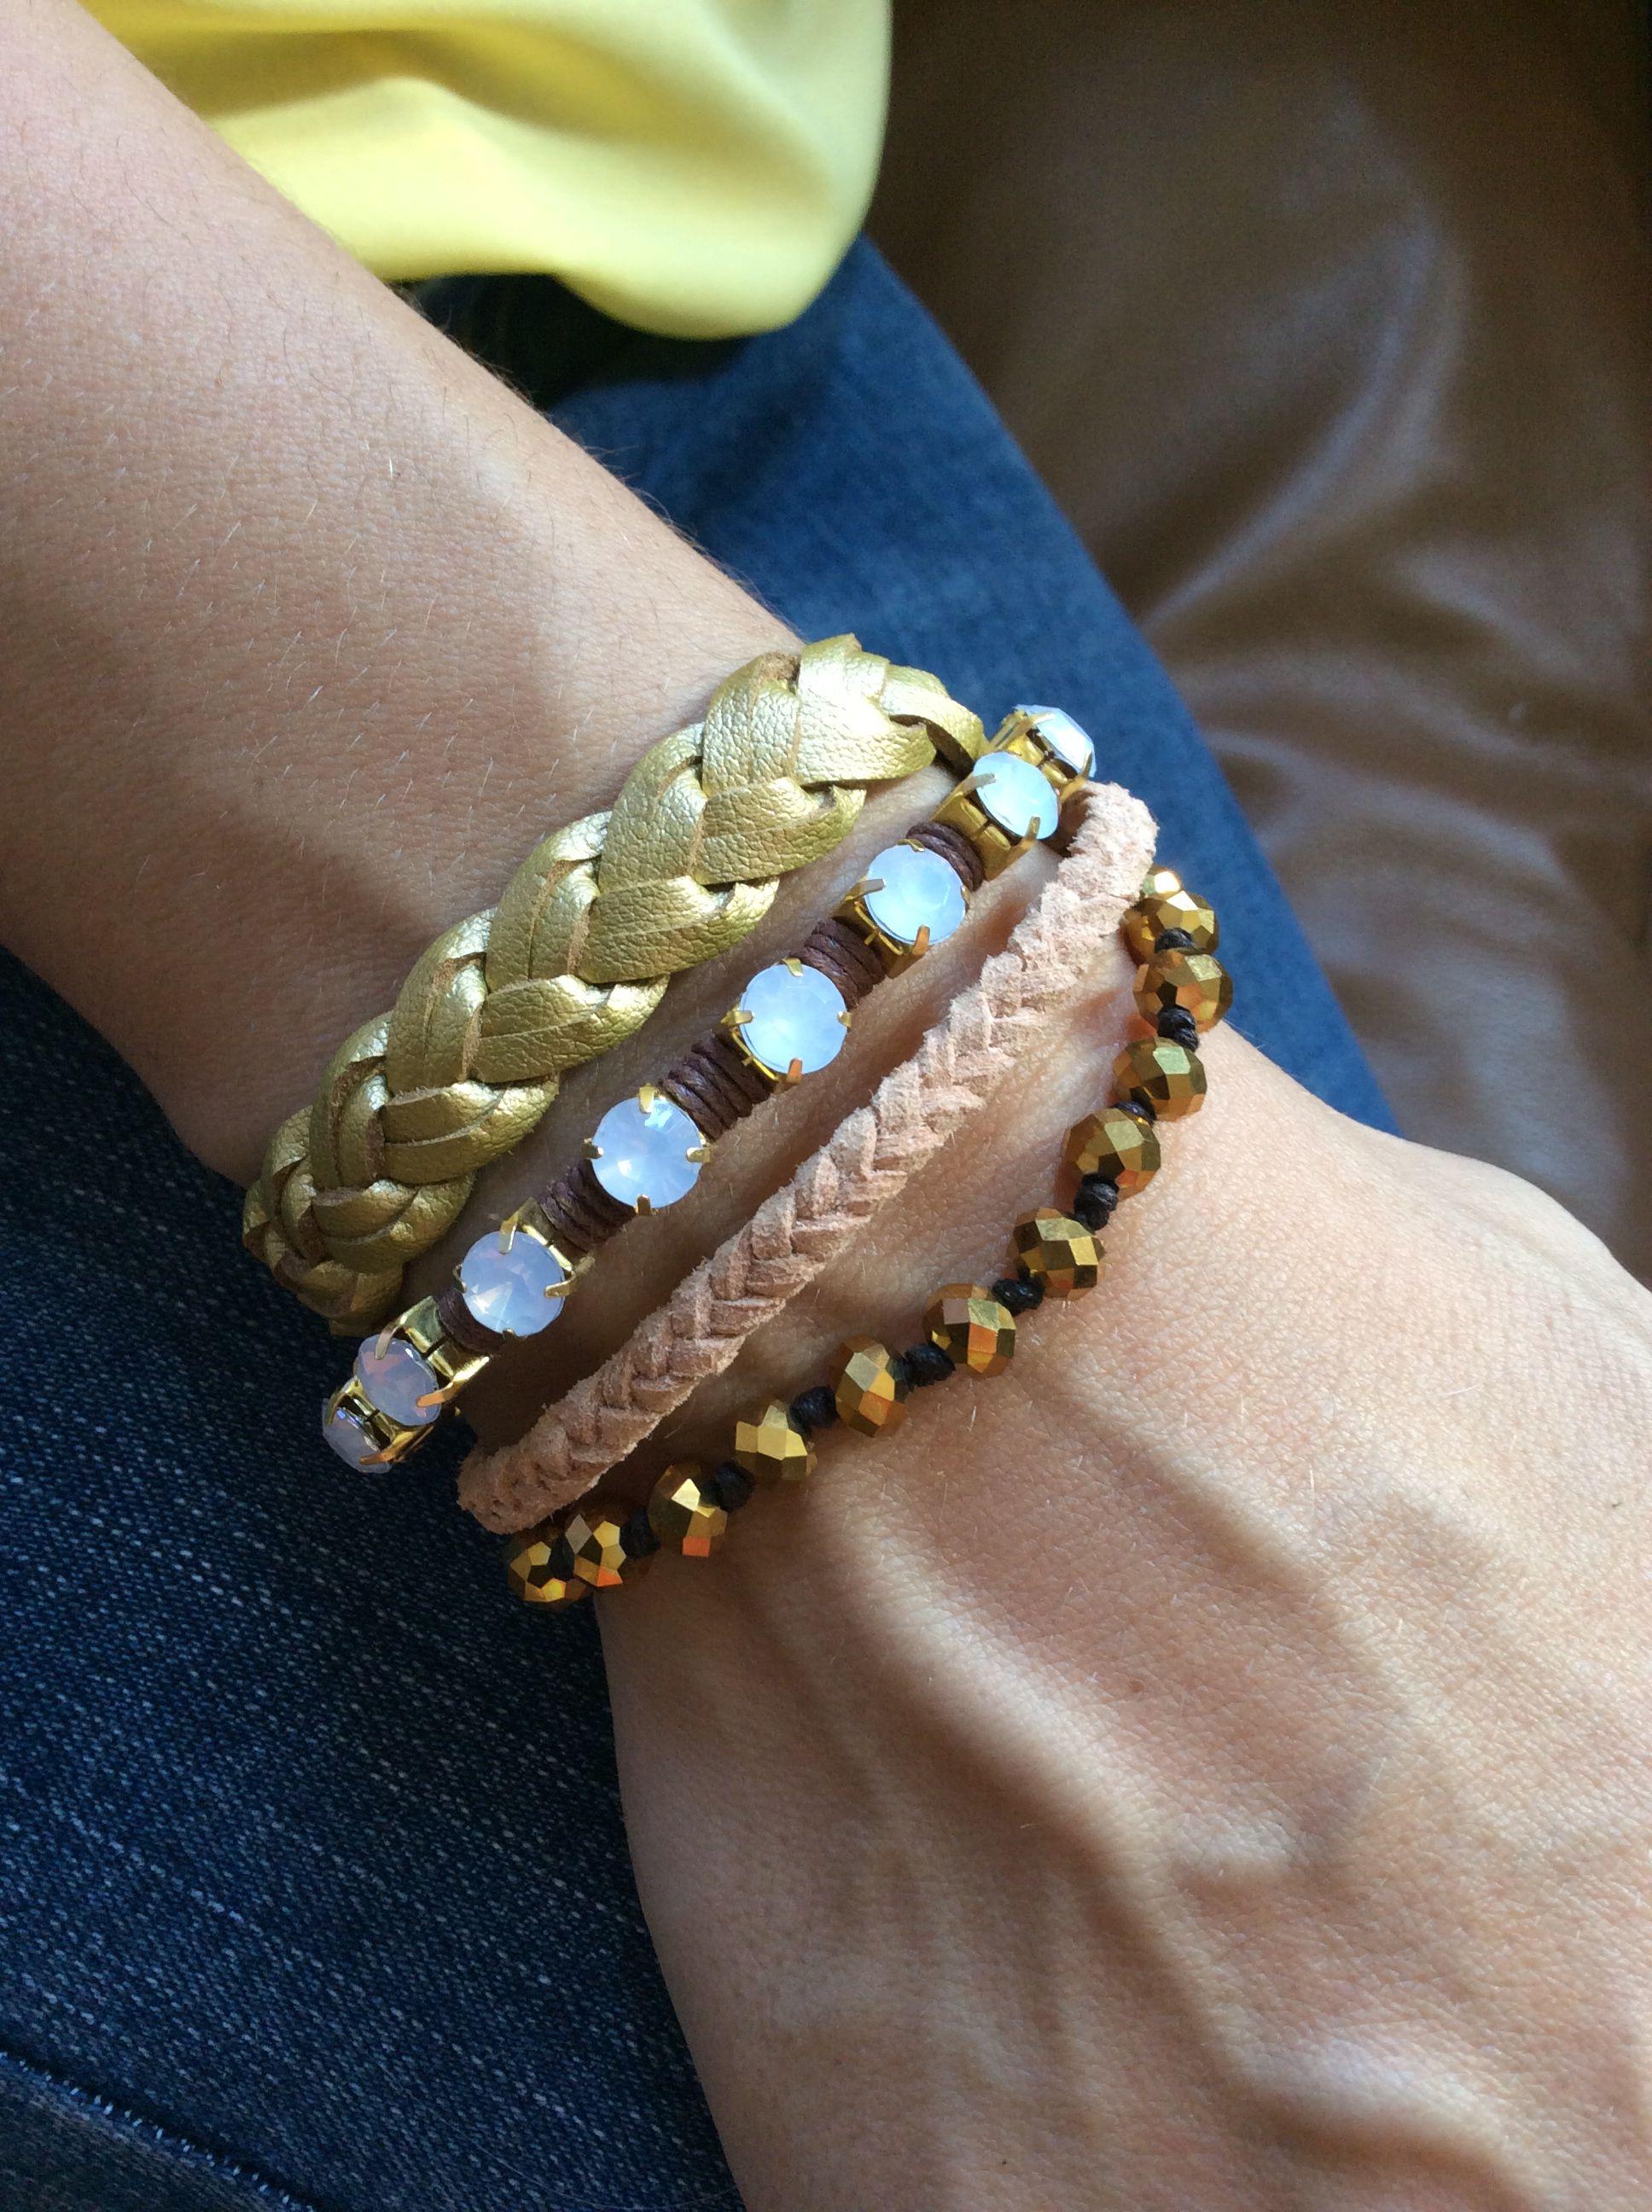 Bracelets, Sonhos de Alice, Friendship Bracelets, Pulseiras, Pulseirismo